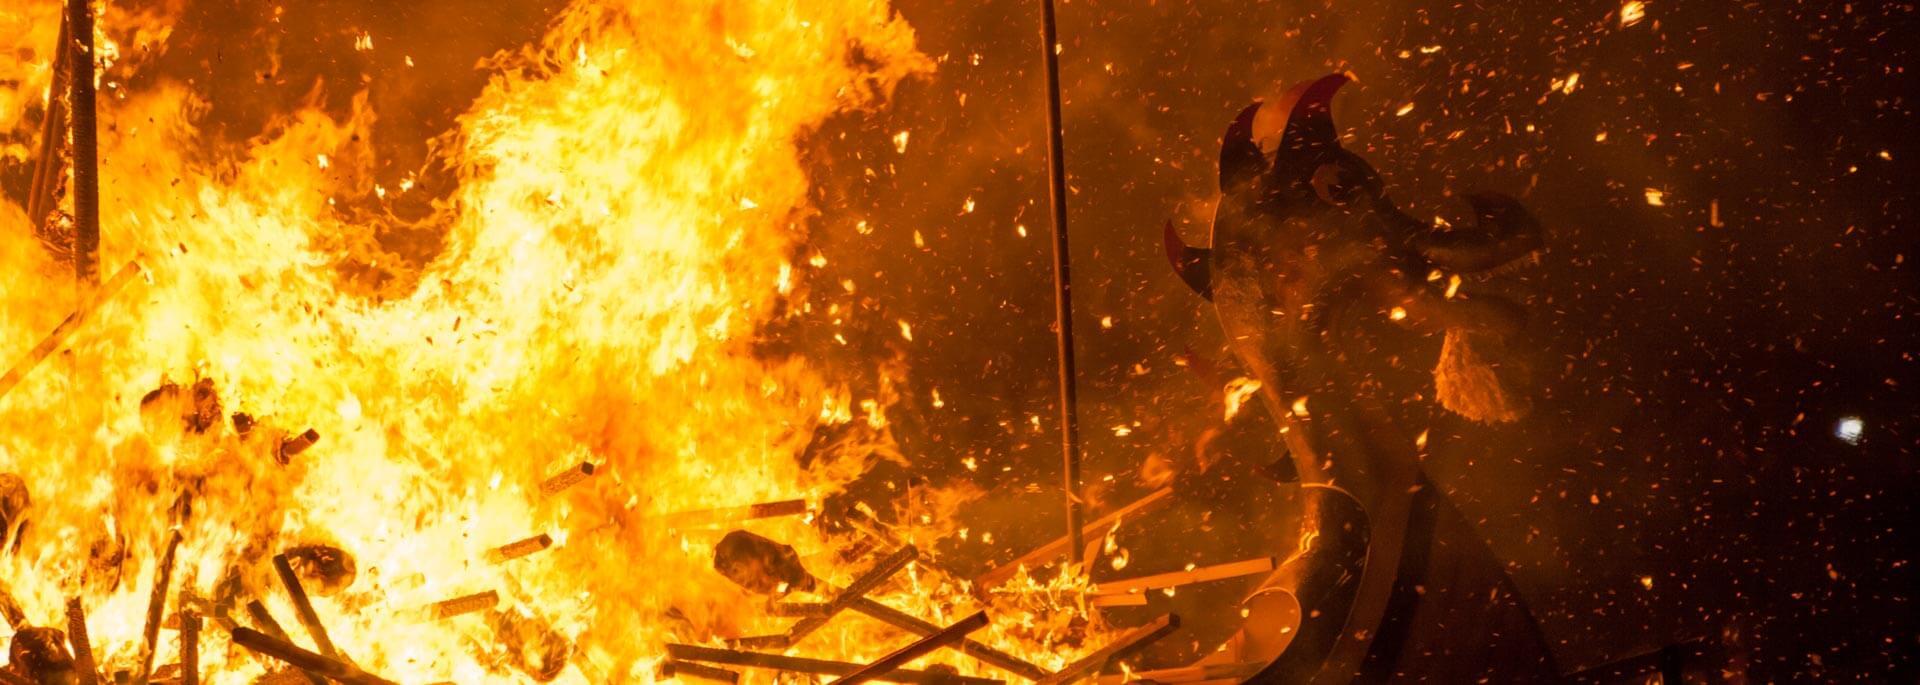 Fotos: Up Helly Aa Feuerfestival auf den Shetlands